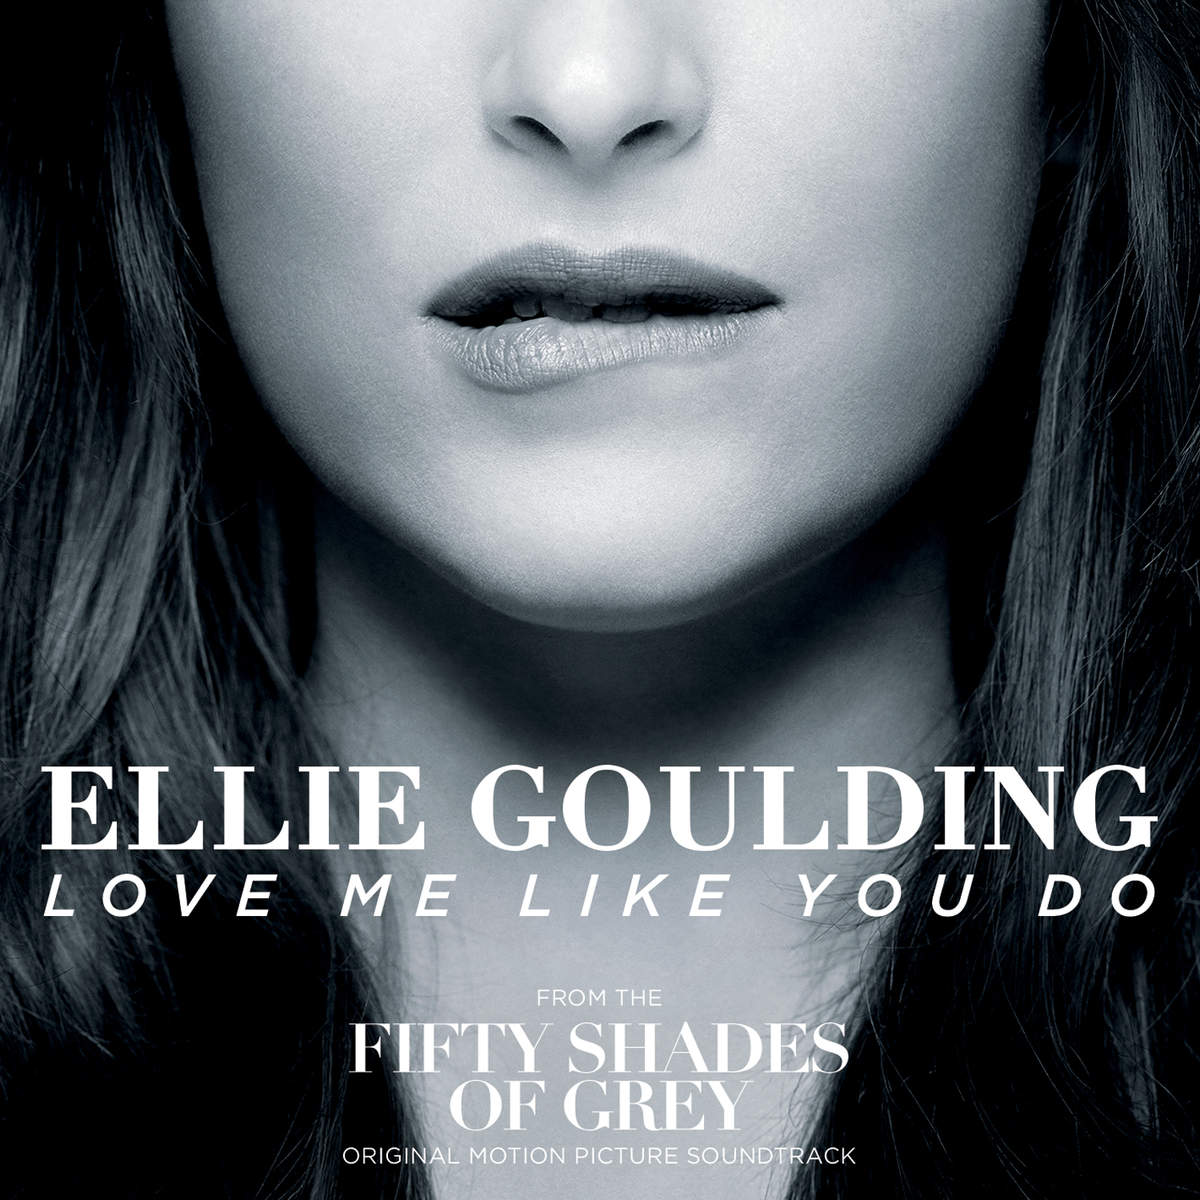 Love Me Like You Do Guitar Chords Ellie Goulding